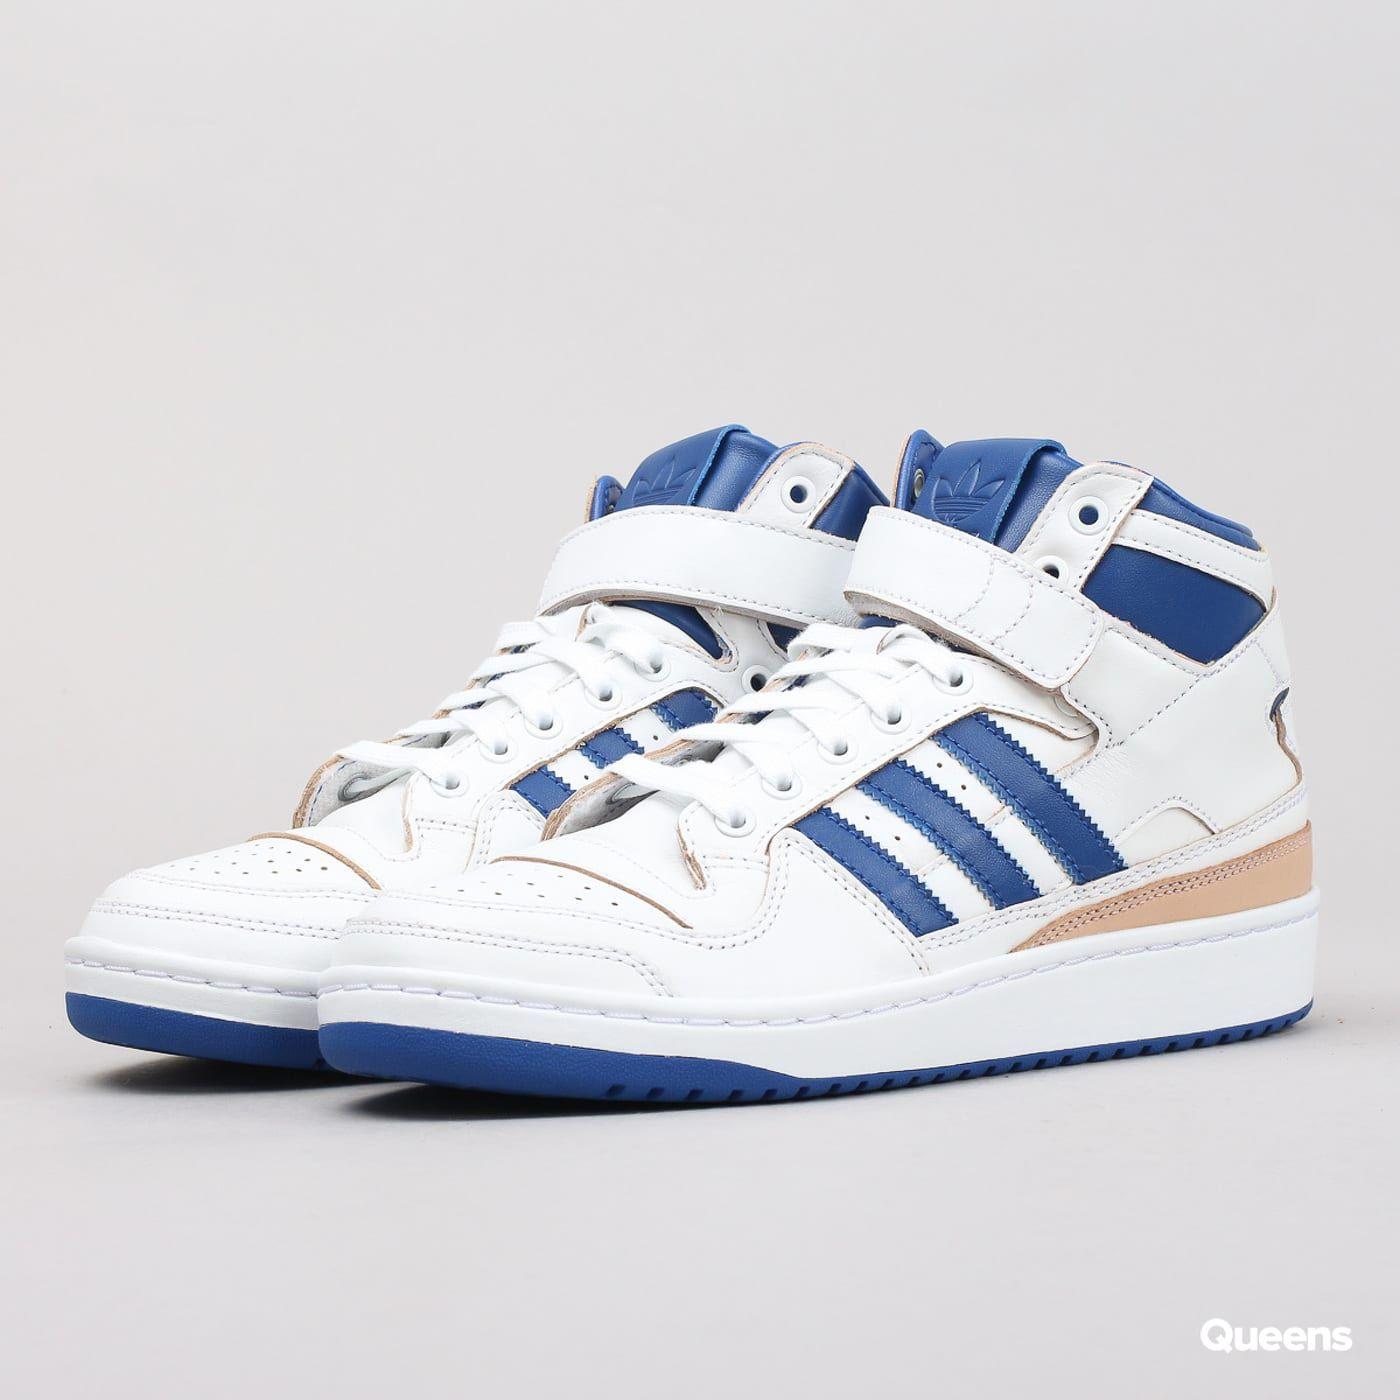 sale retailer d41a2 9cdb0 Boty adidas Forum Mid (Wrap) (BY4412) – Queens 💚